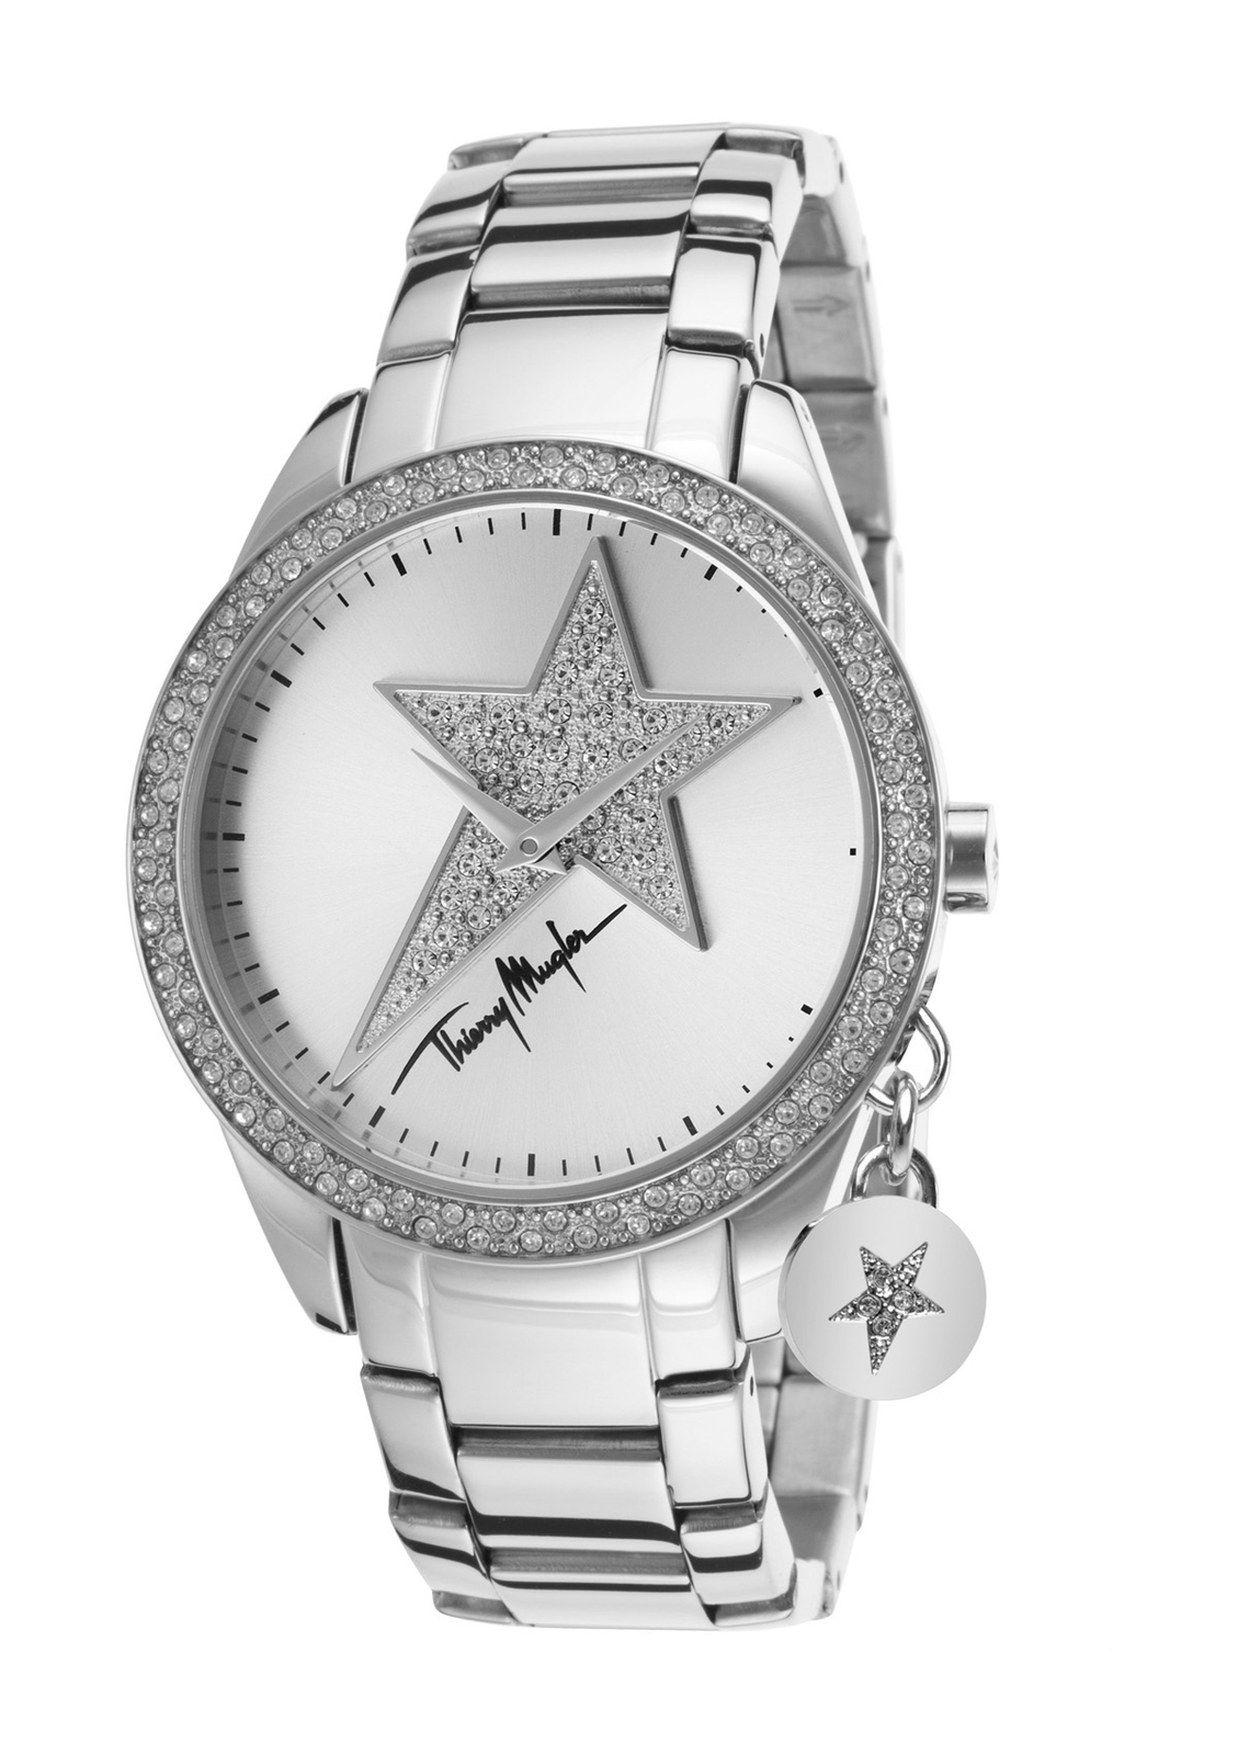 ideeli | THIERRY MUGLER Ladies Bracelet Watch